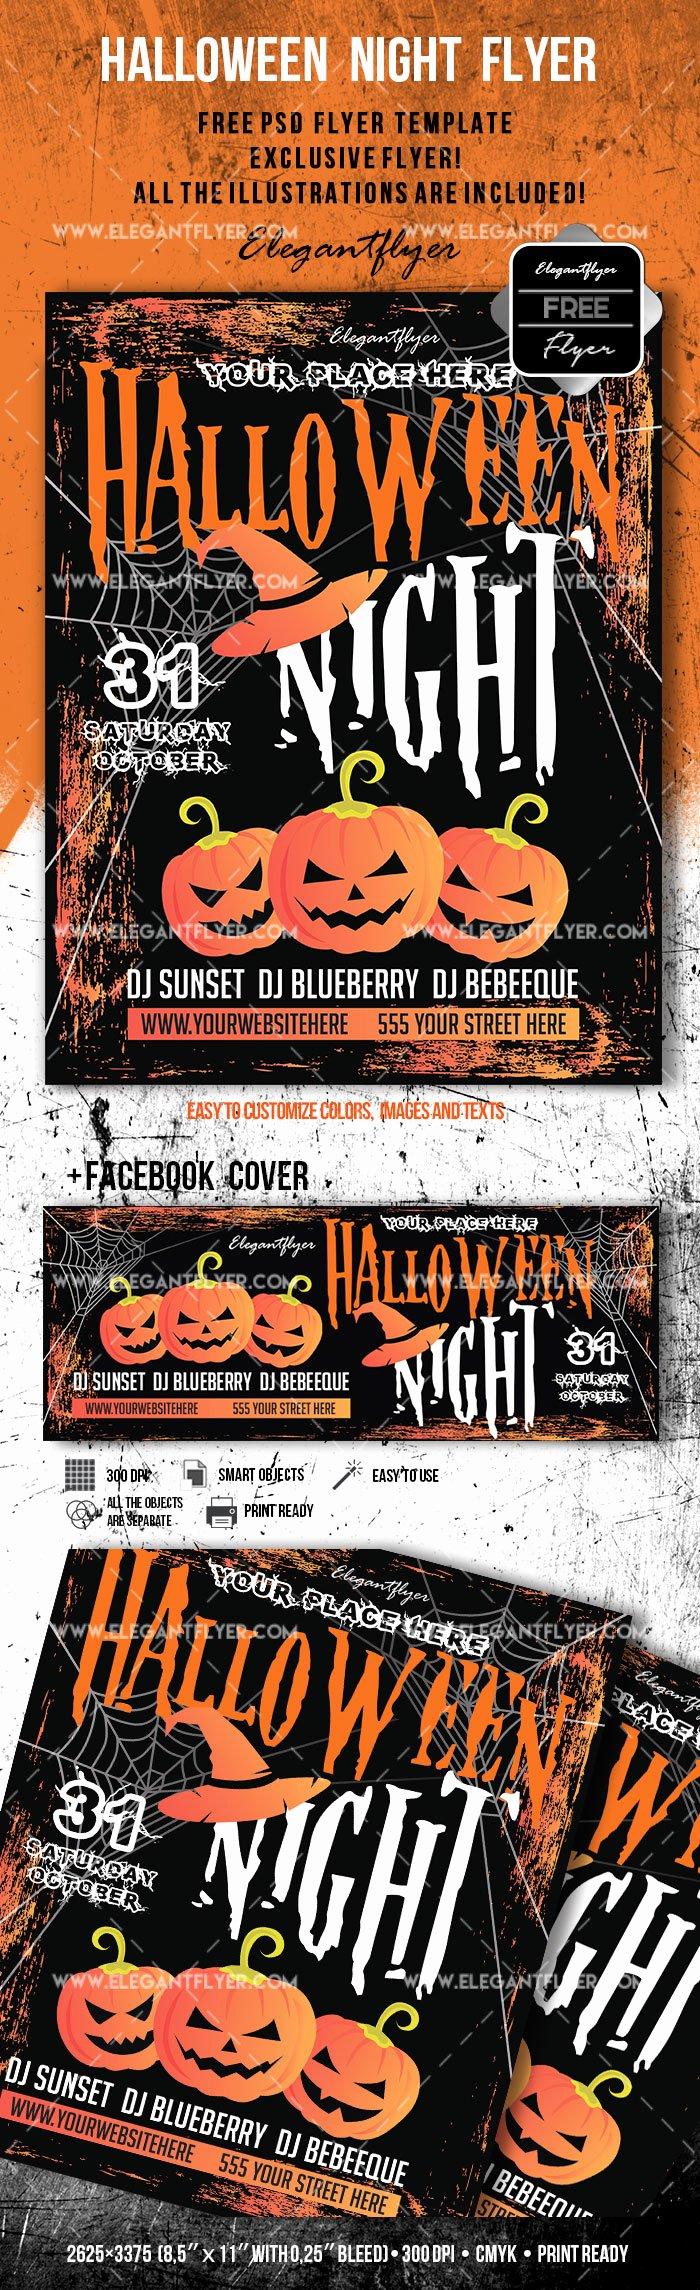 Halloween – Free Flyer Psd Template – by Elegantflyer